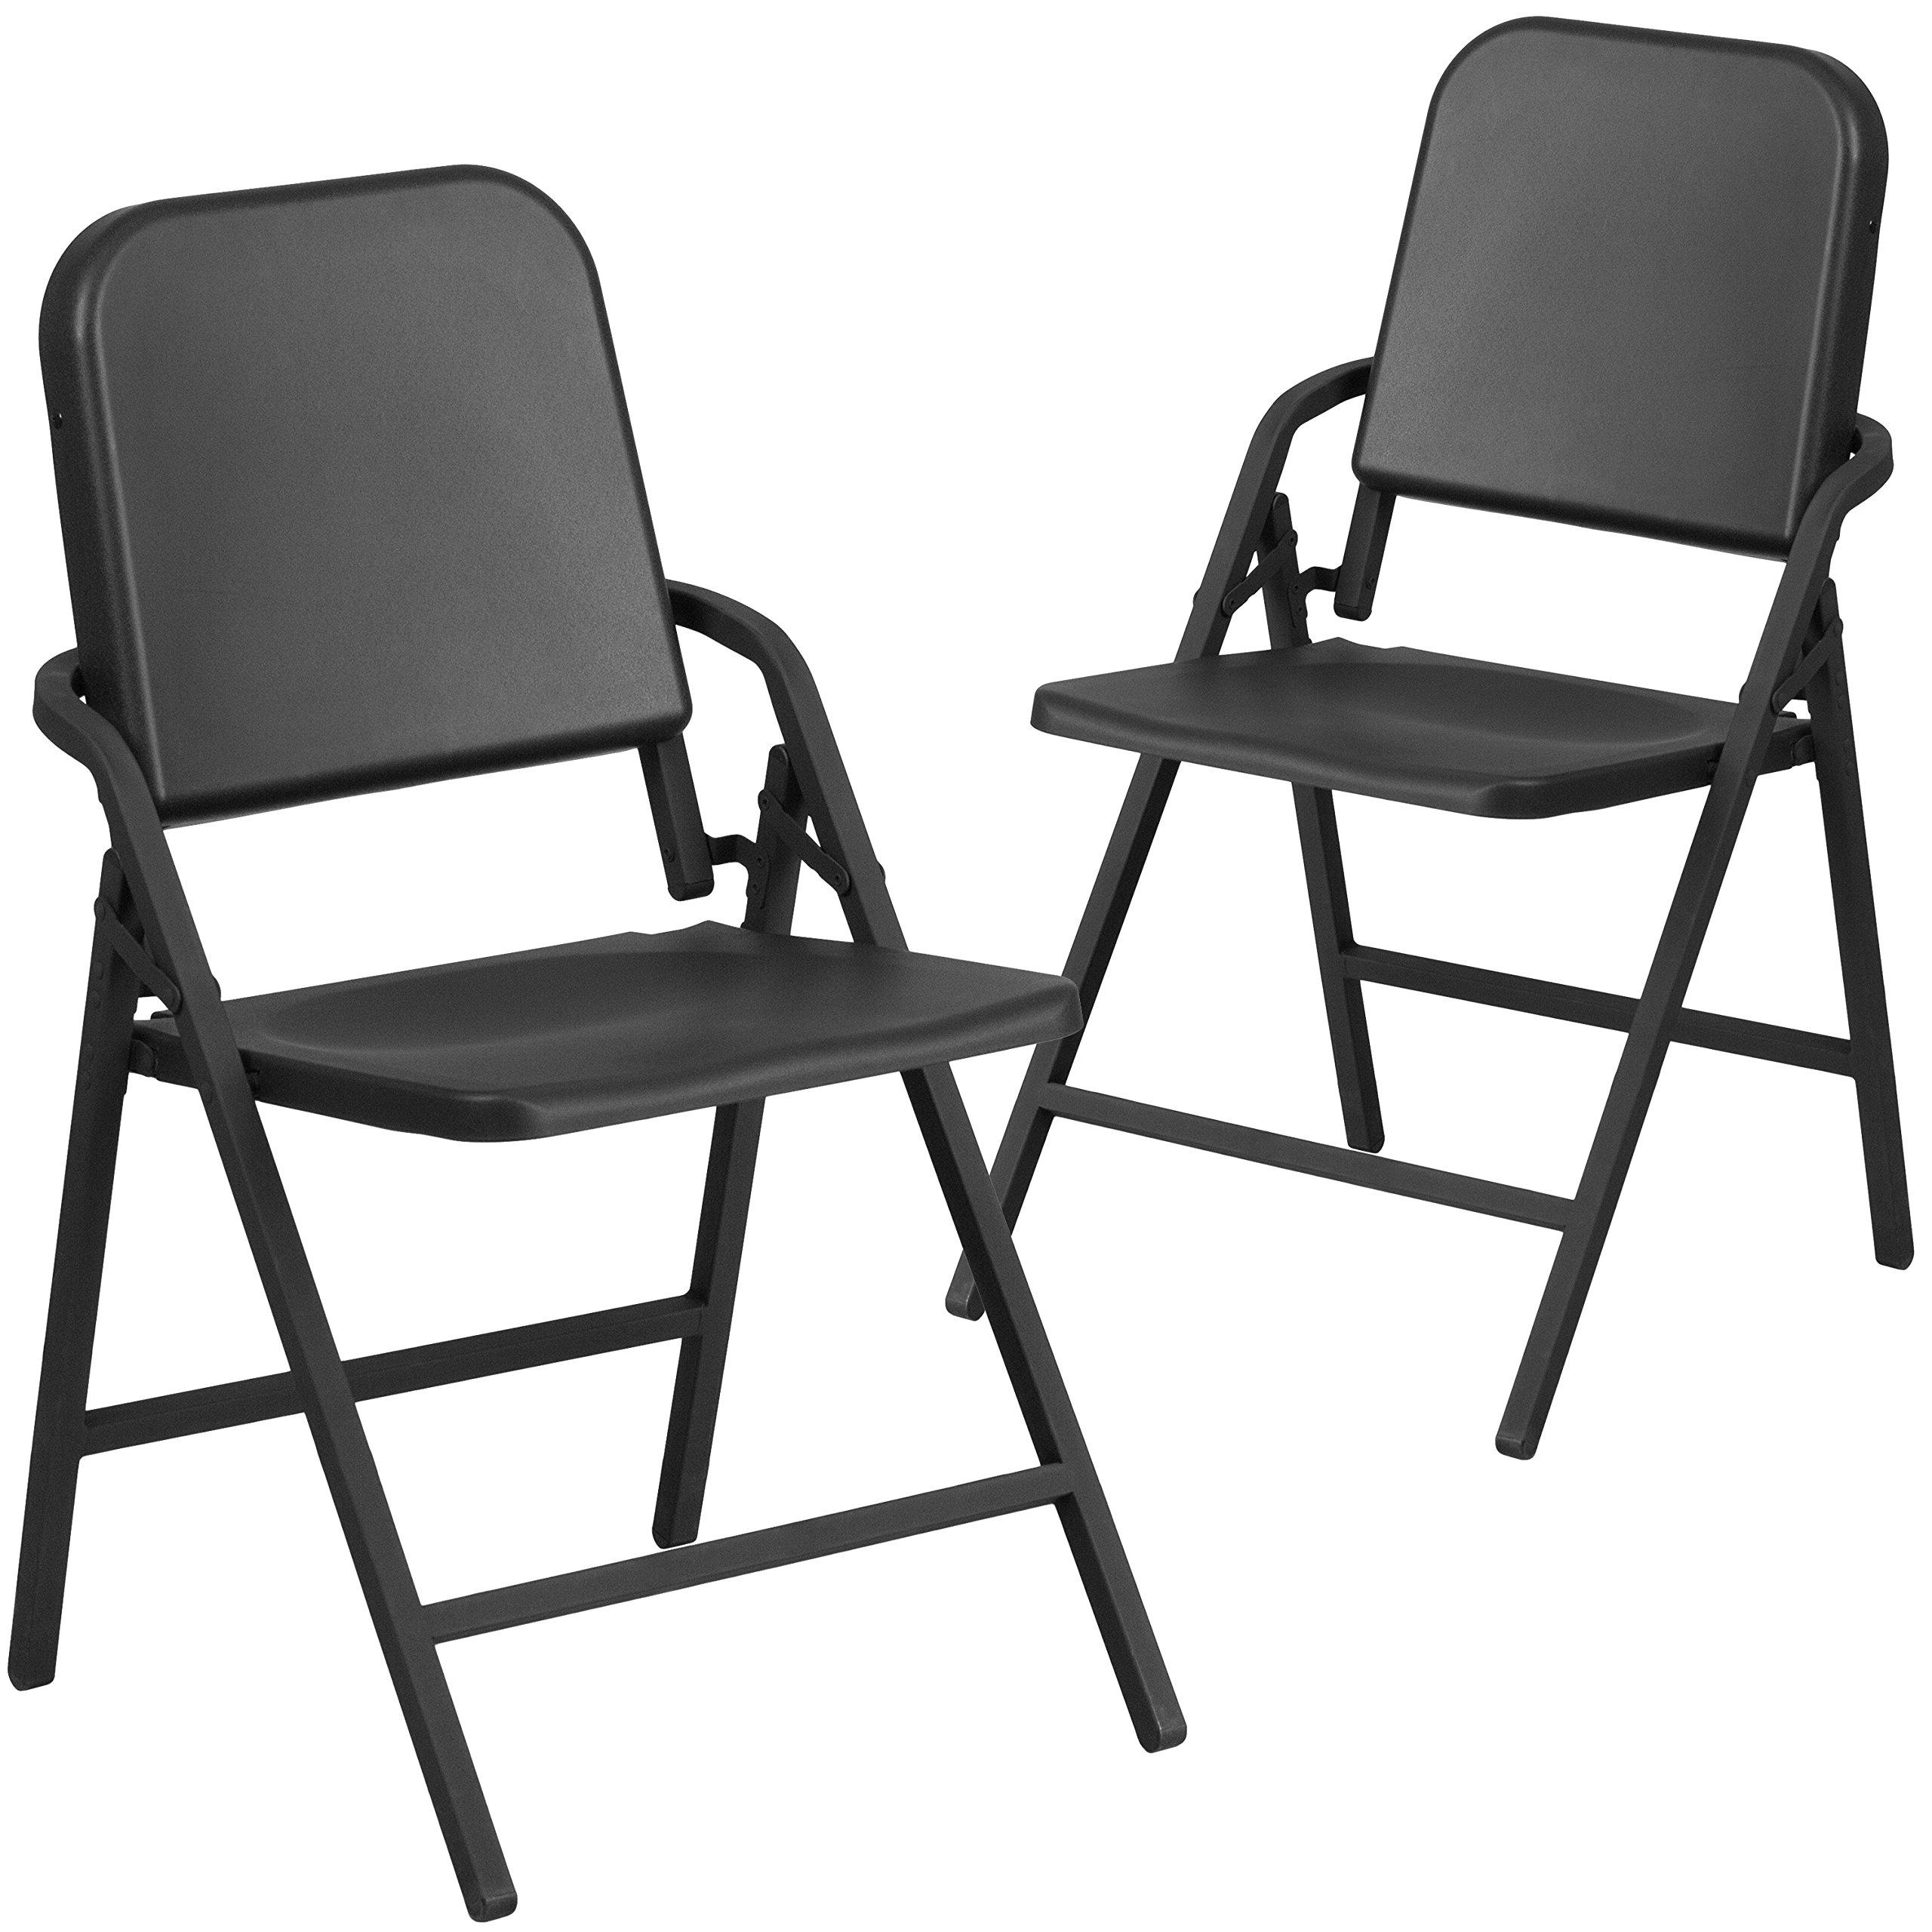 Flash Furniture 2 Pk. HERCULES Series Black High Density Folding Melody Band/Music Chair